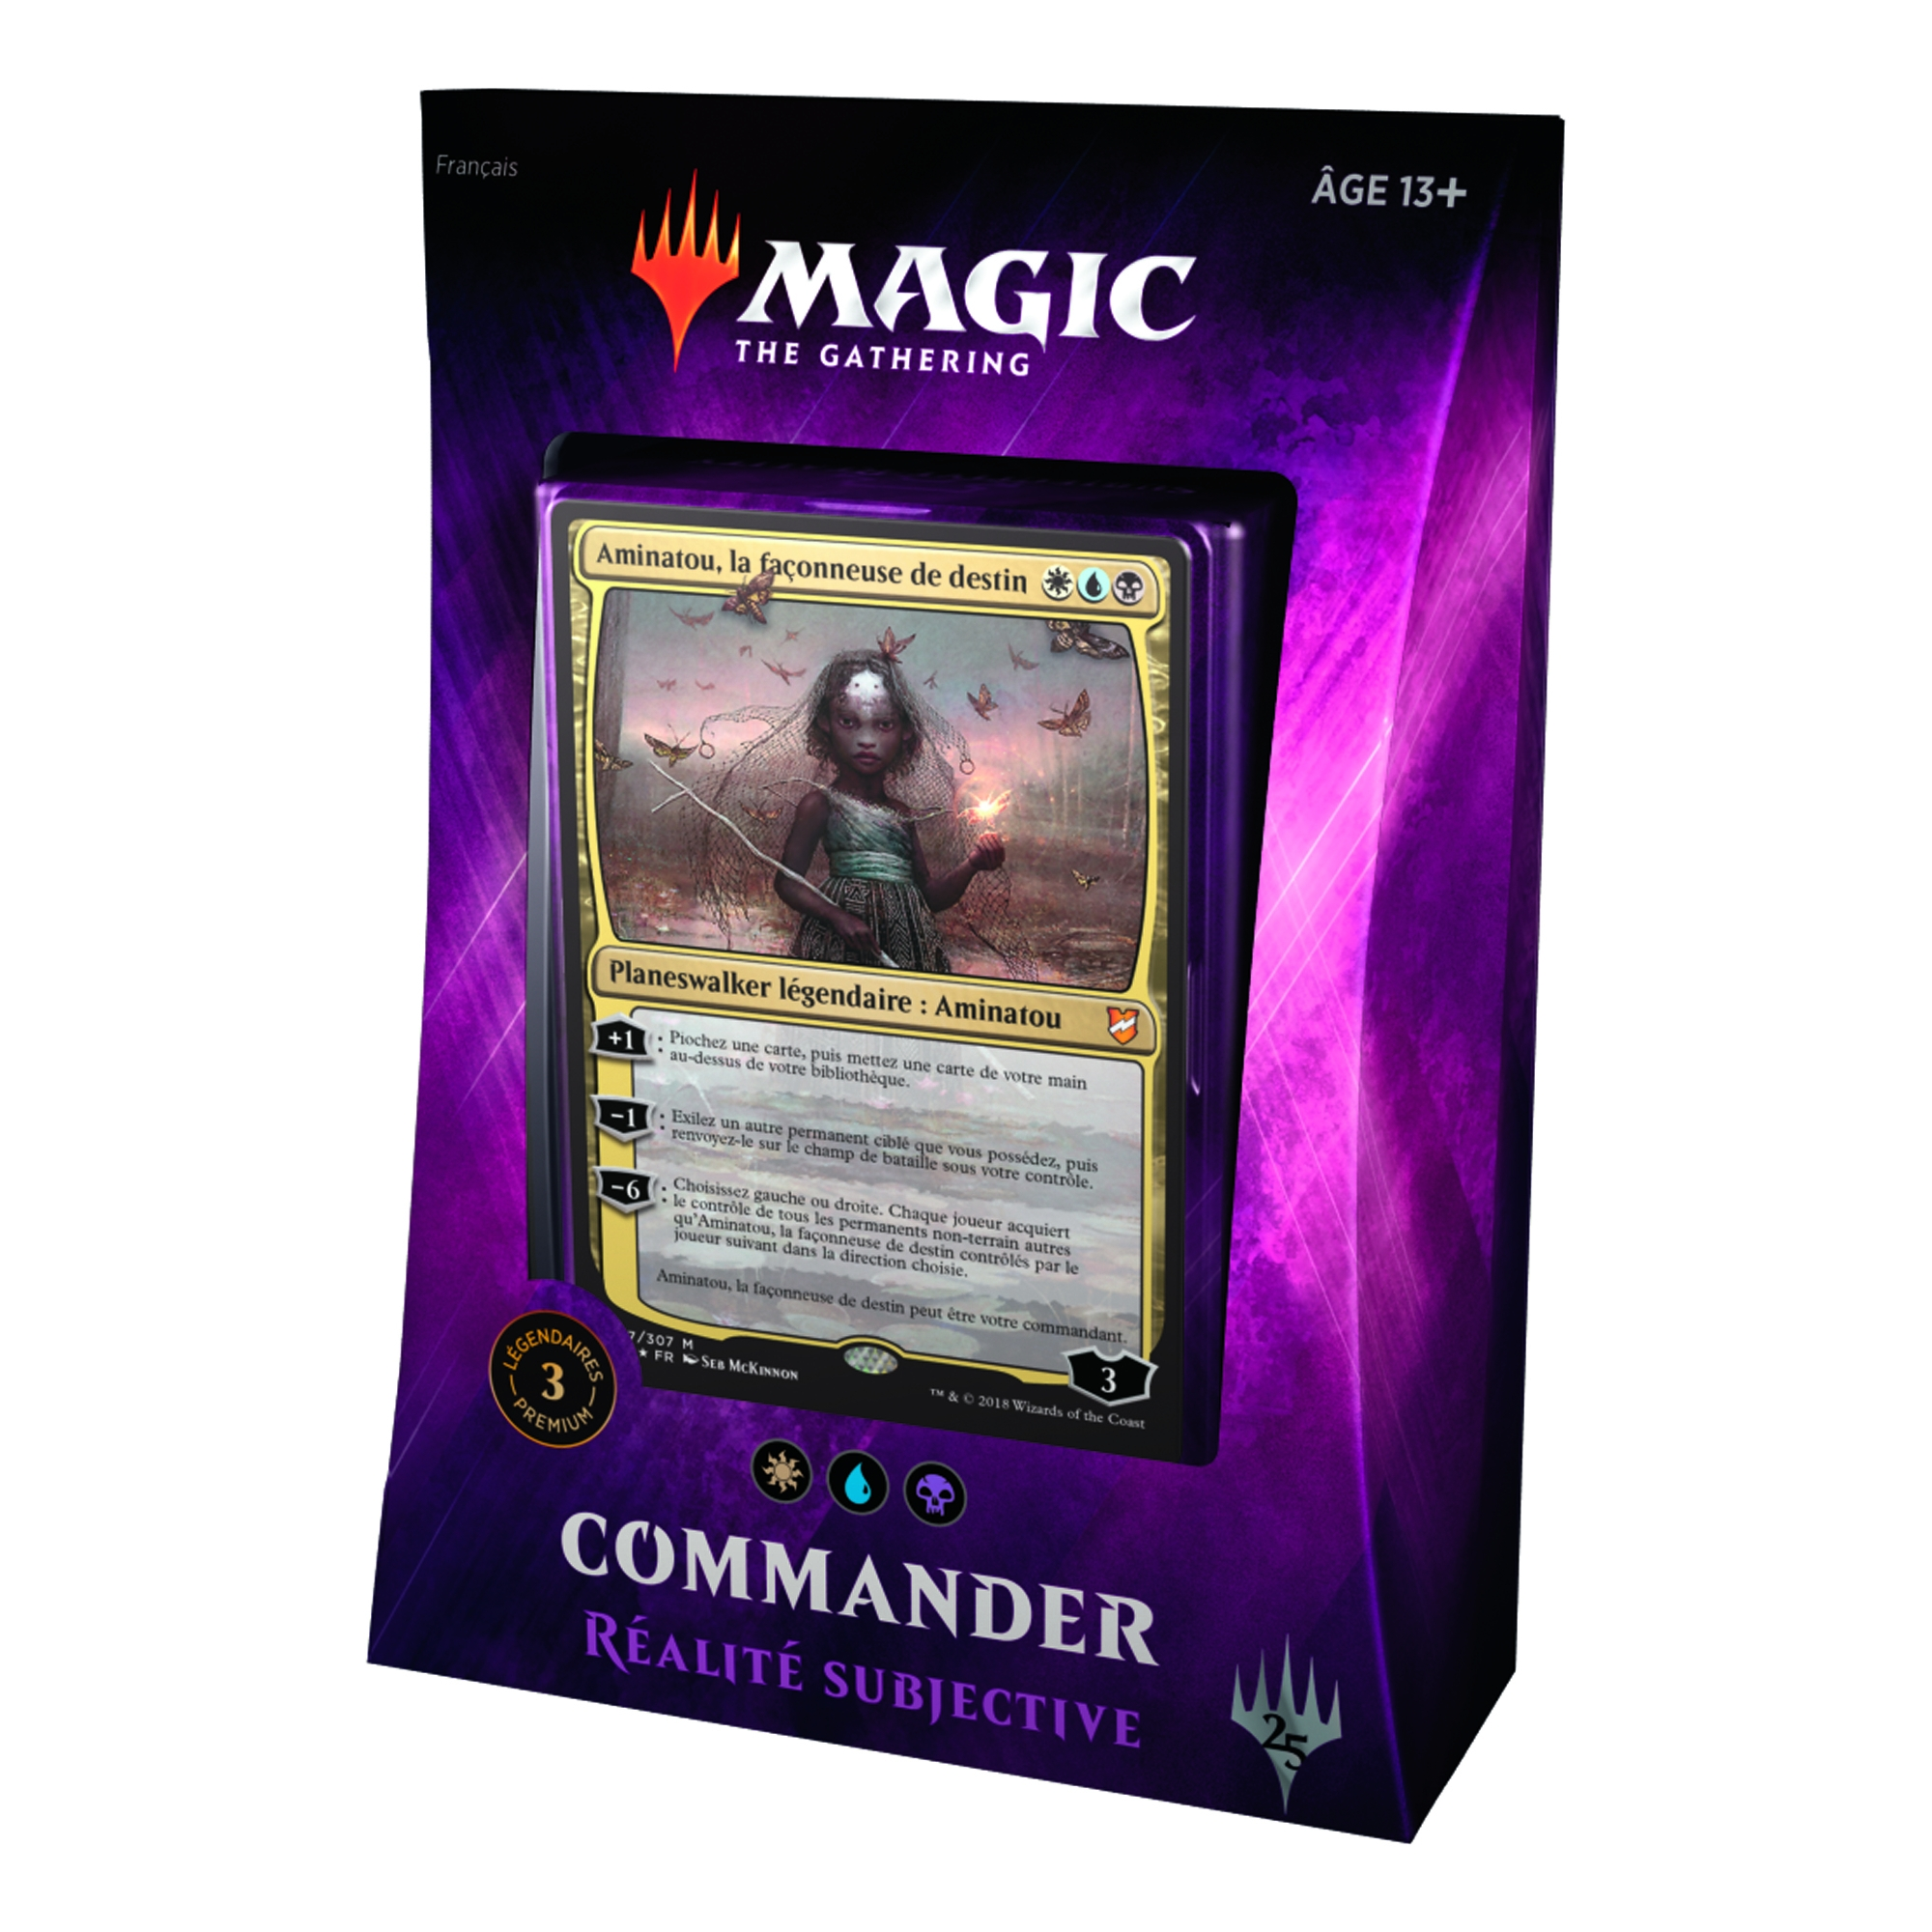 Magiccorporation Deck Preconstruit Commander 2018 Realite Subjective Magic The Gathering